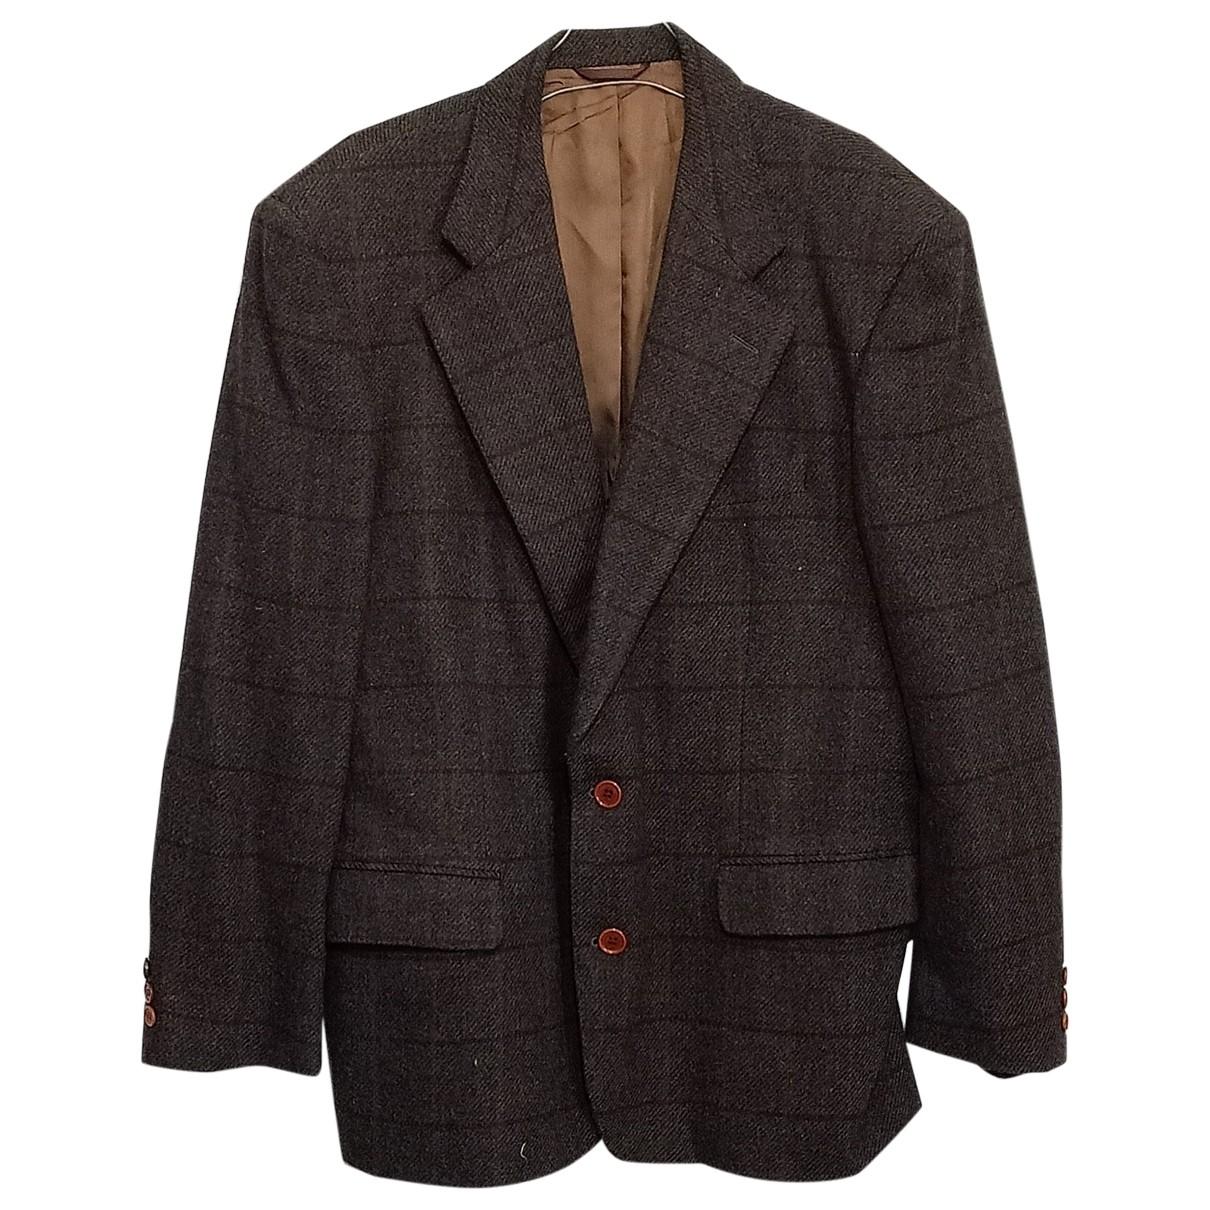 Burberry \N Multicolour Wool jacket  for Men M International